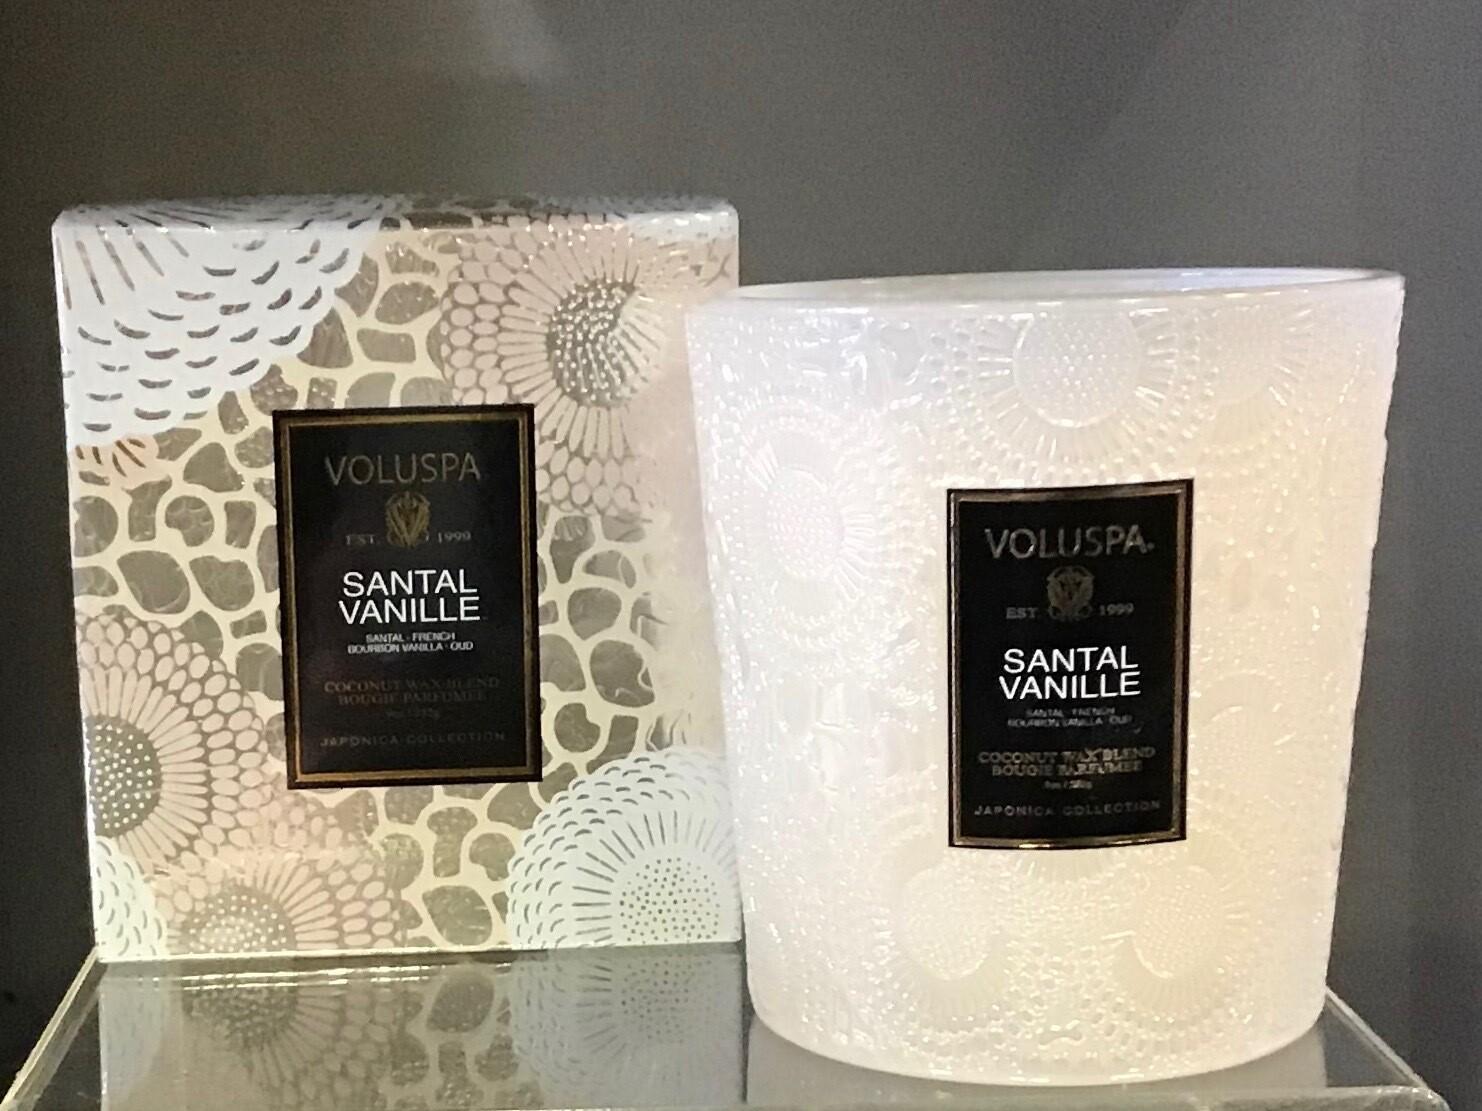 Santal Vanilla Candle by Voluspa